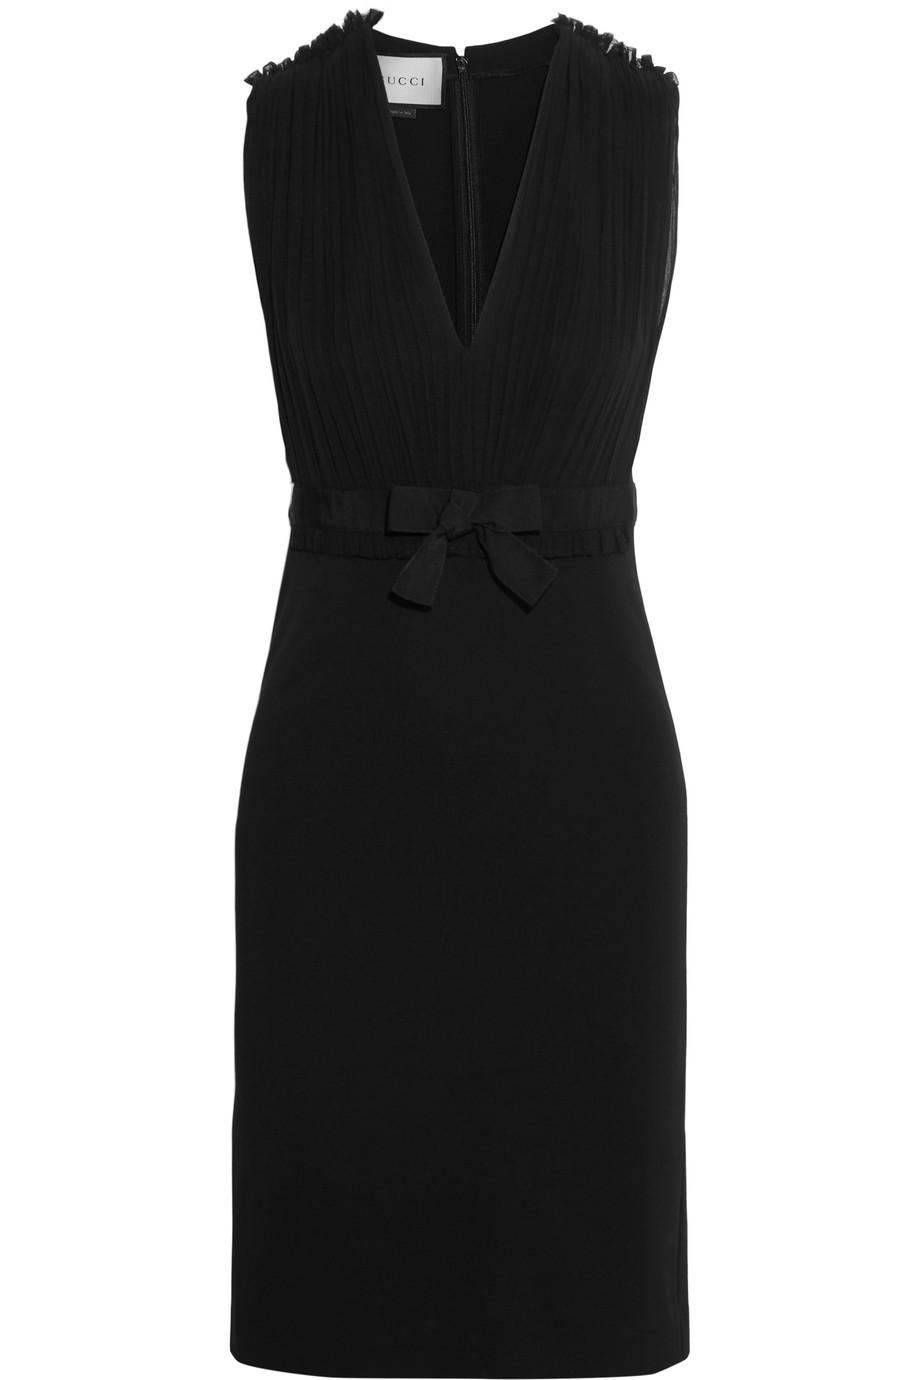 Gucci Pleated Silk-Chiffon and Stretch-Crepe Dress, Black, Women's, Size: L